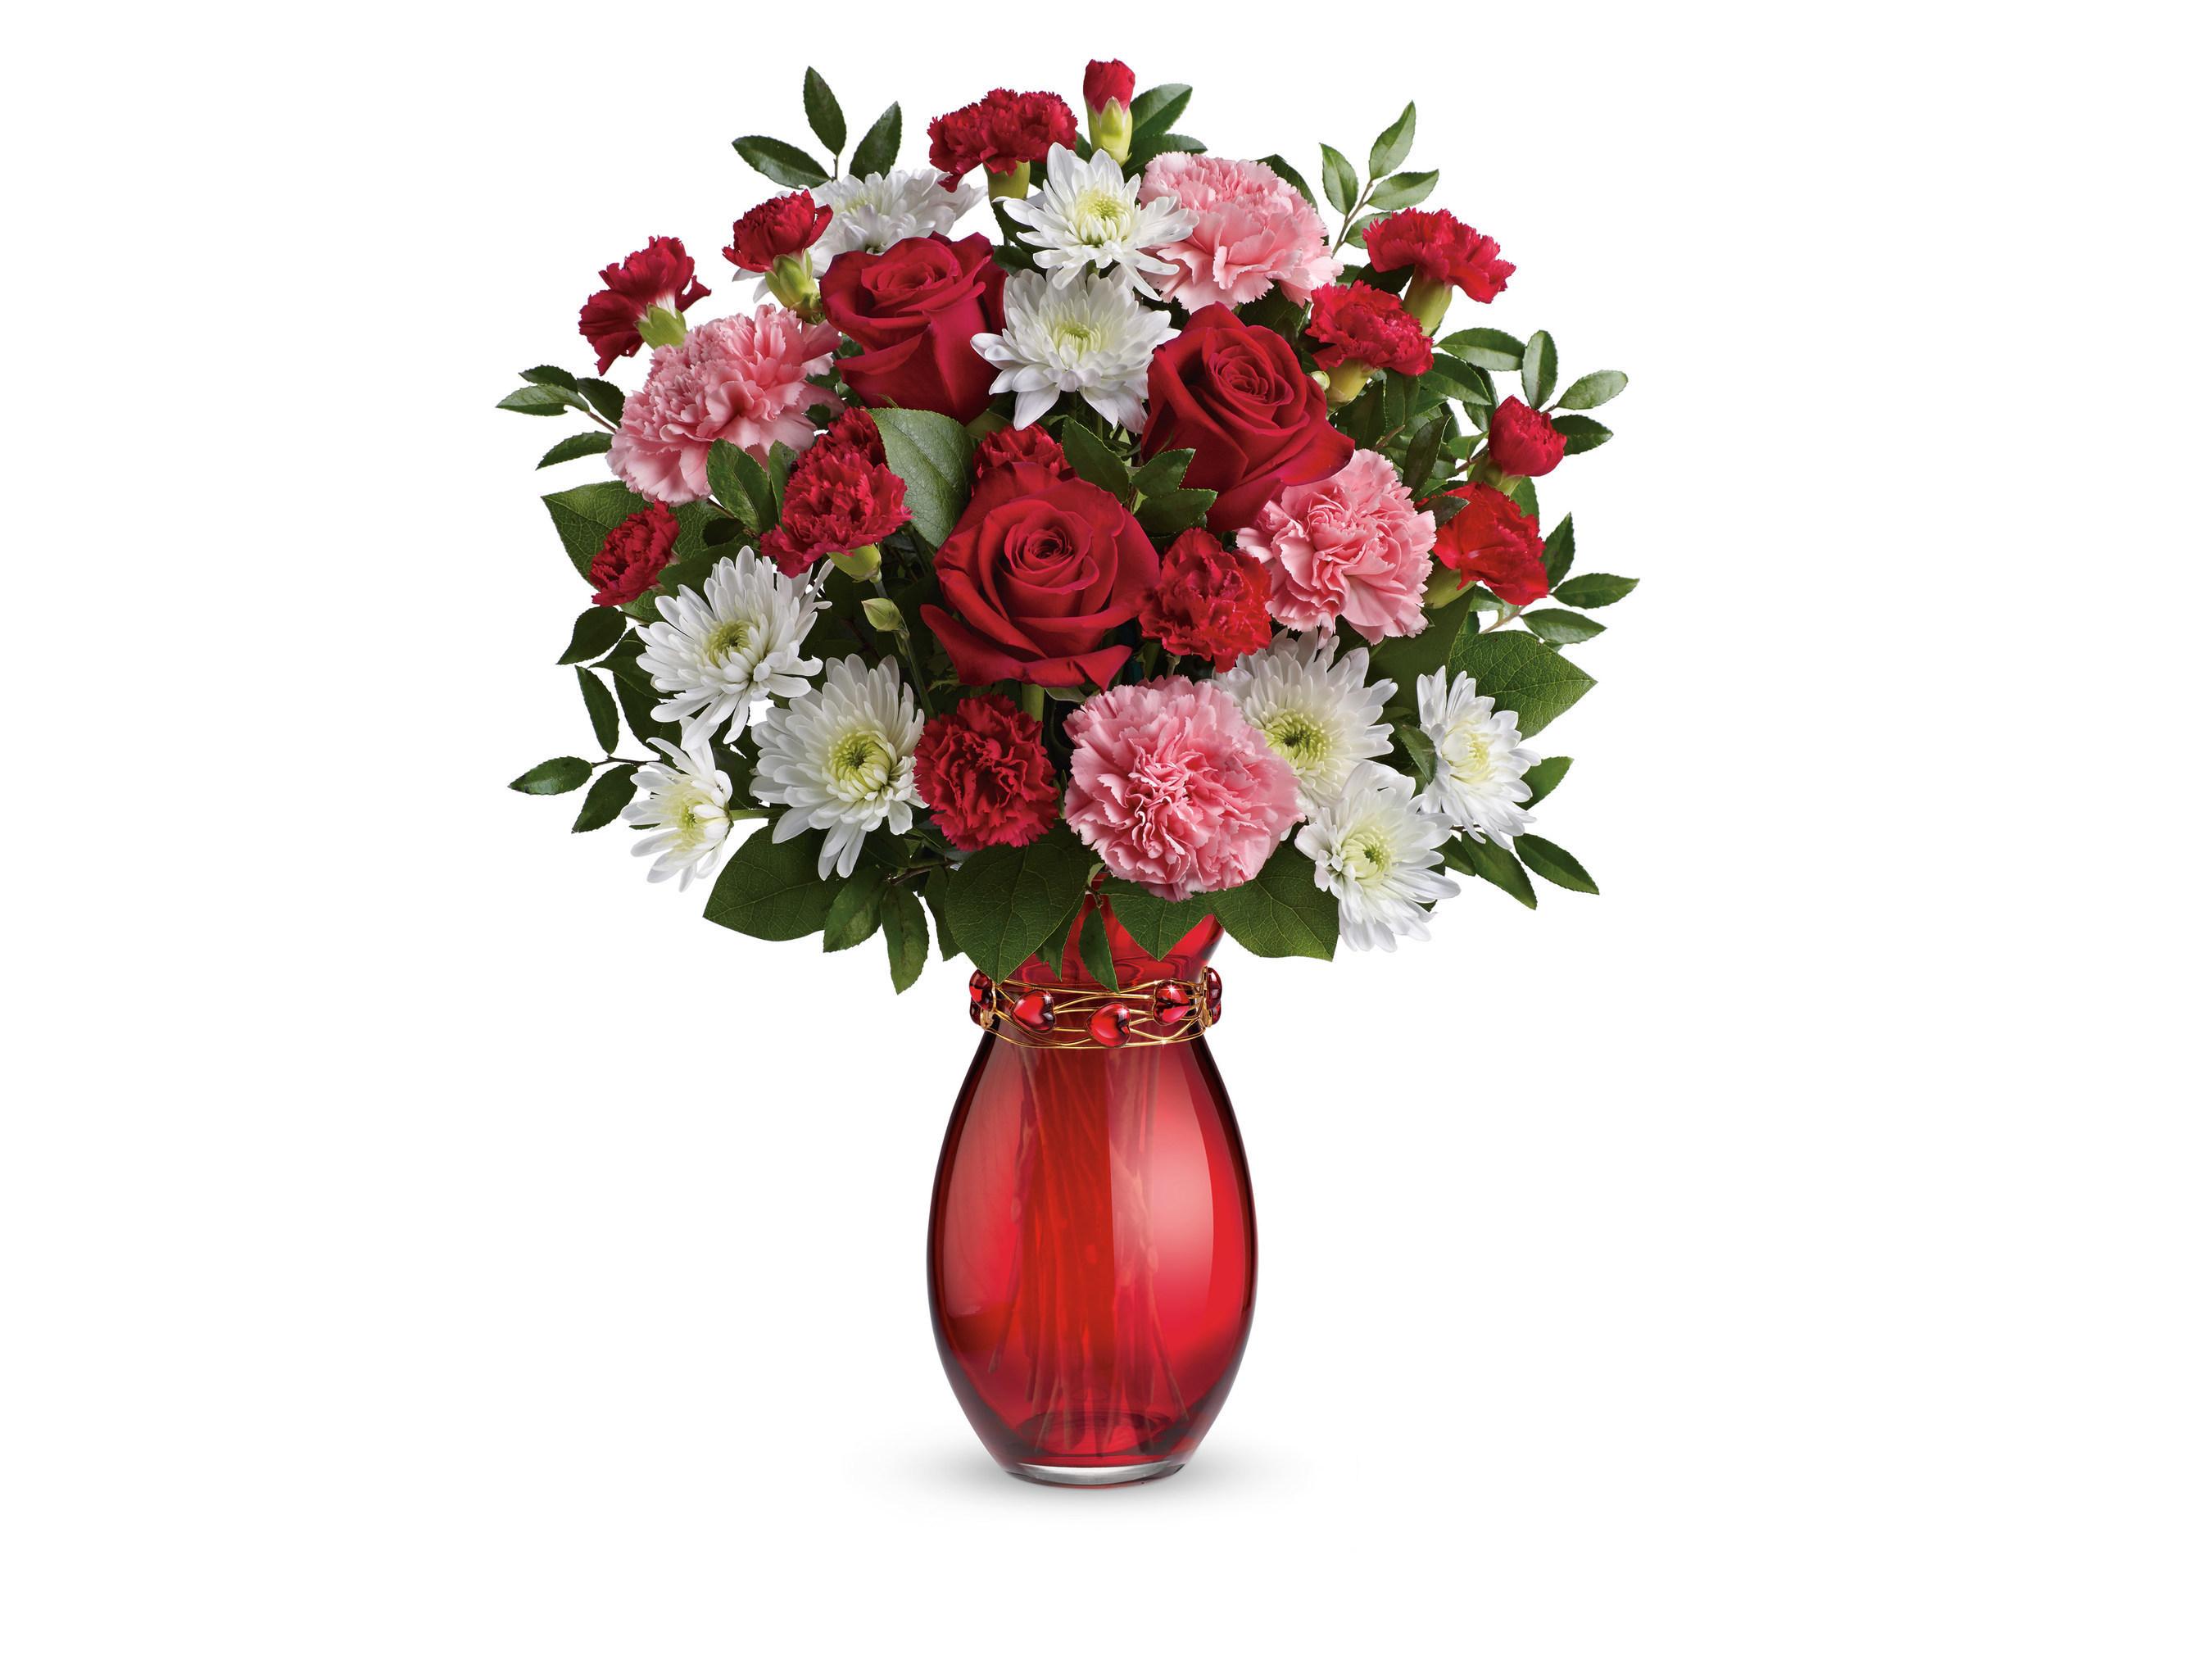 Teleflora's Sweet Embrace Bouquet. (Photo courtesy of Teleflora.)